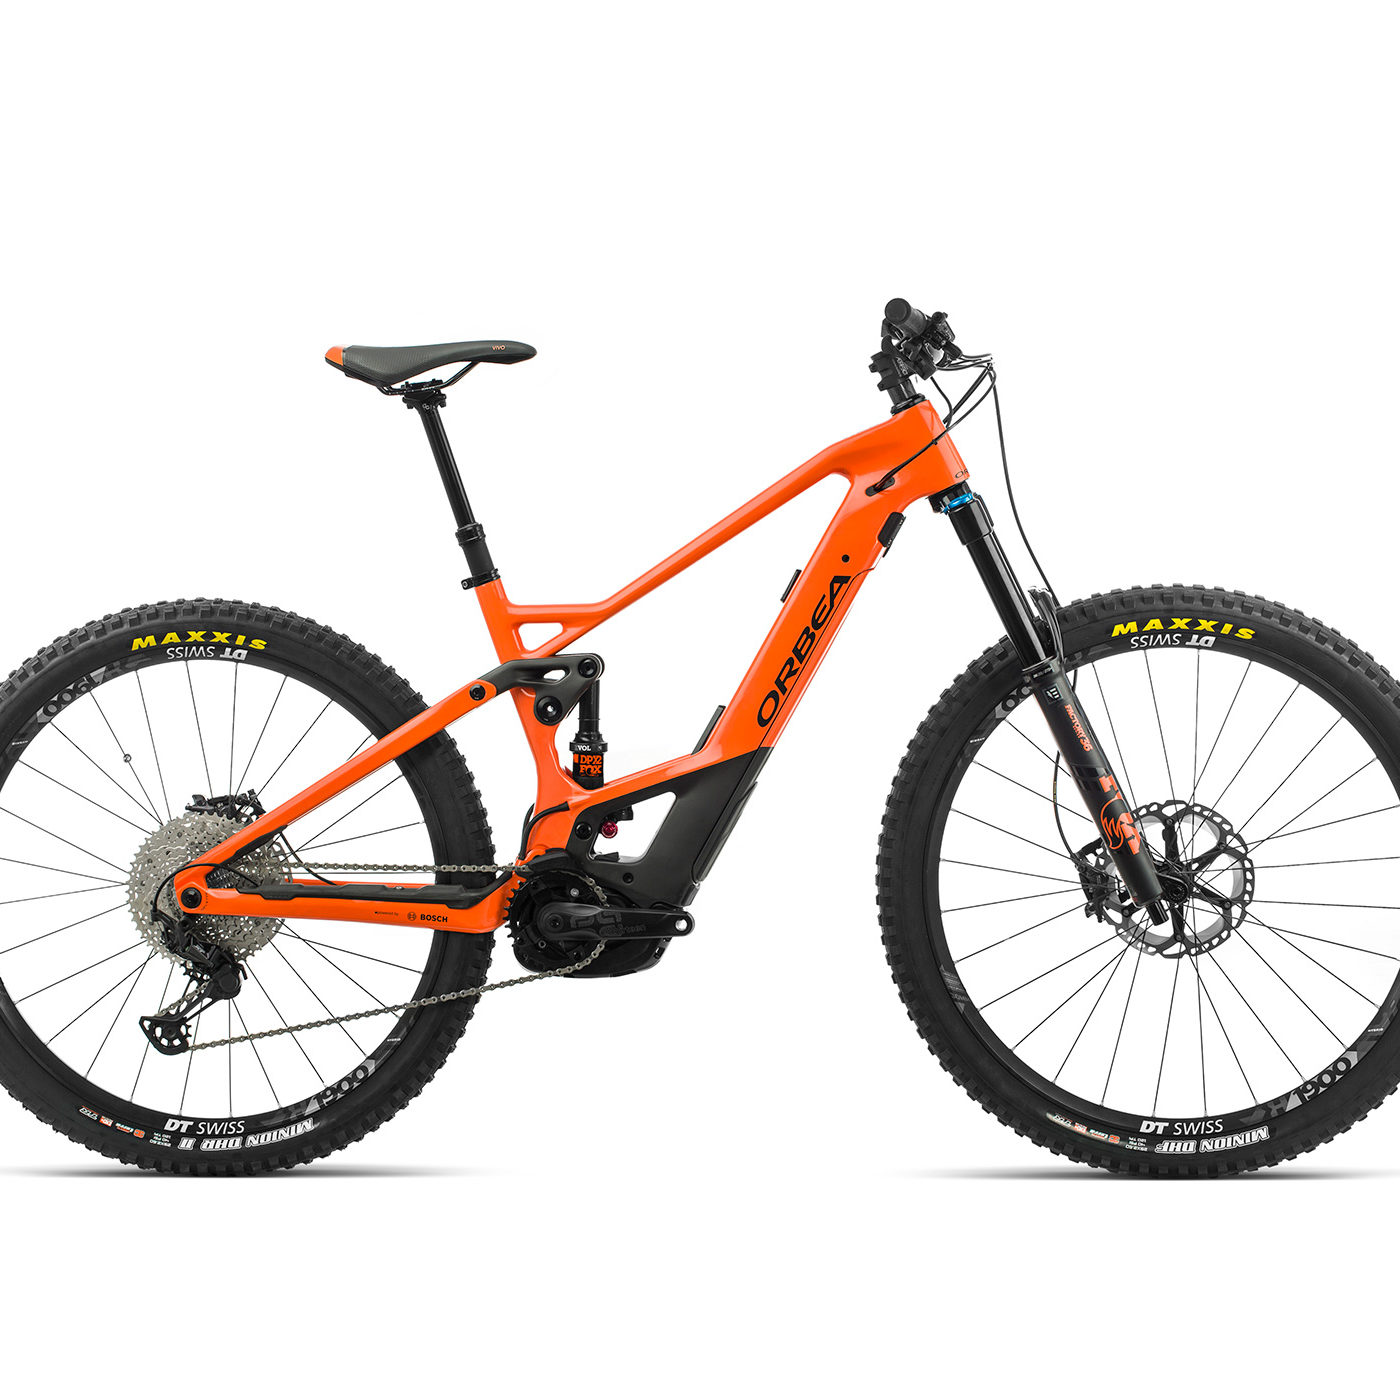 ORBEA WILD FS M10 ebike - ORANJE (GLOSS) / ZWART (DOF) @G-Bikes